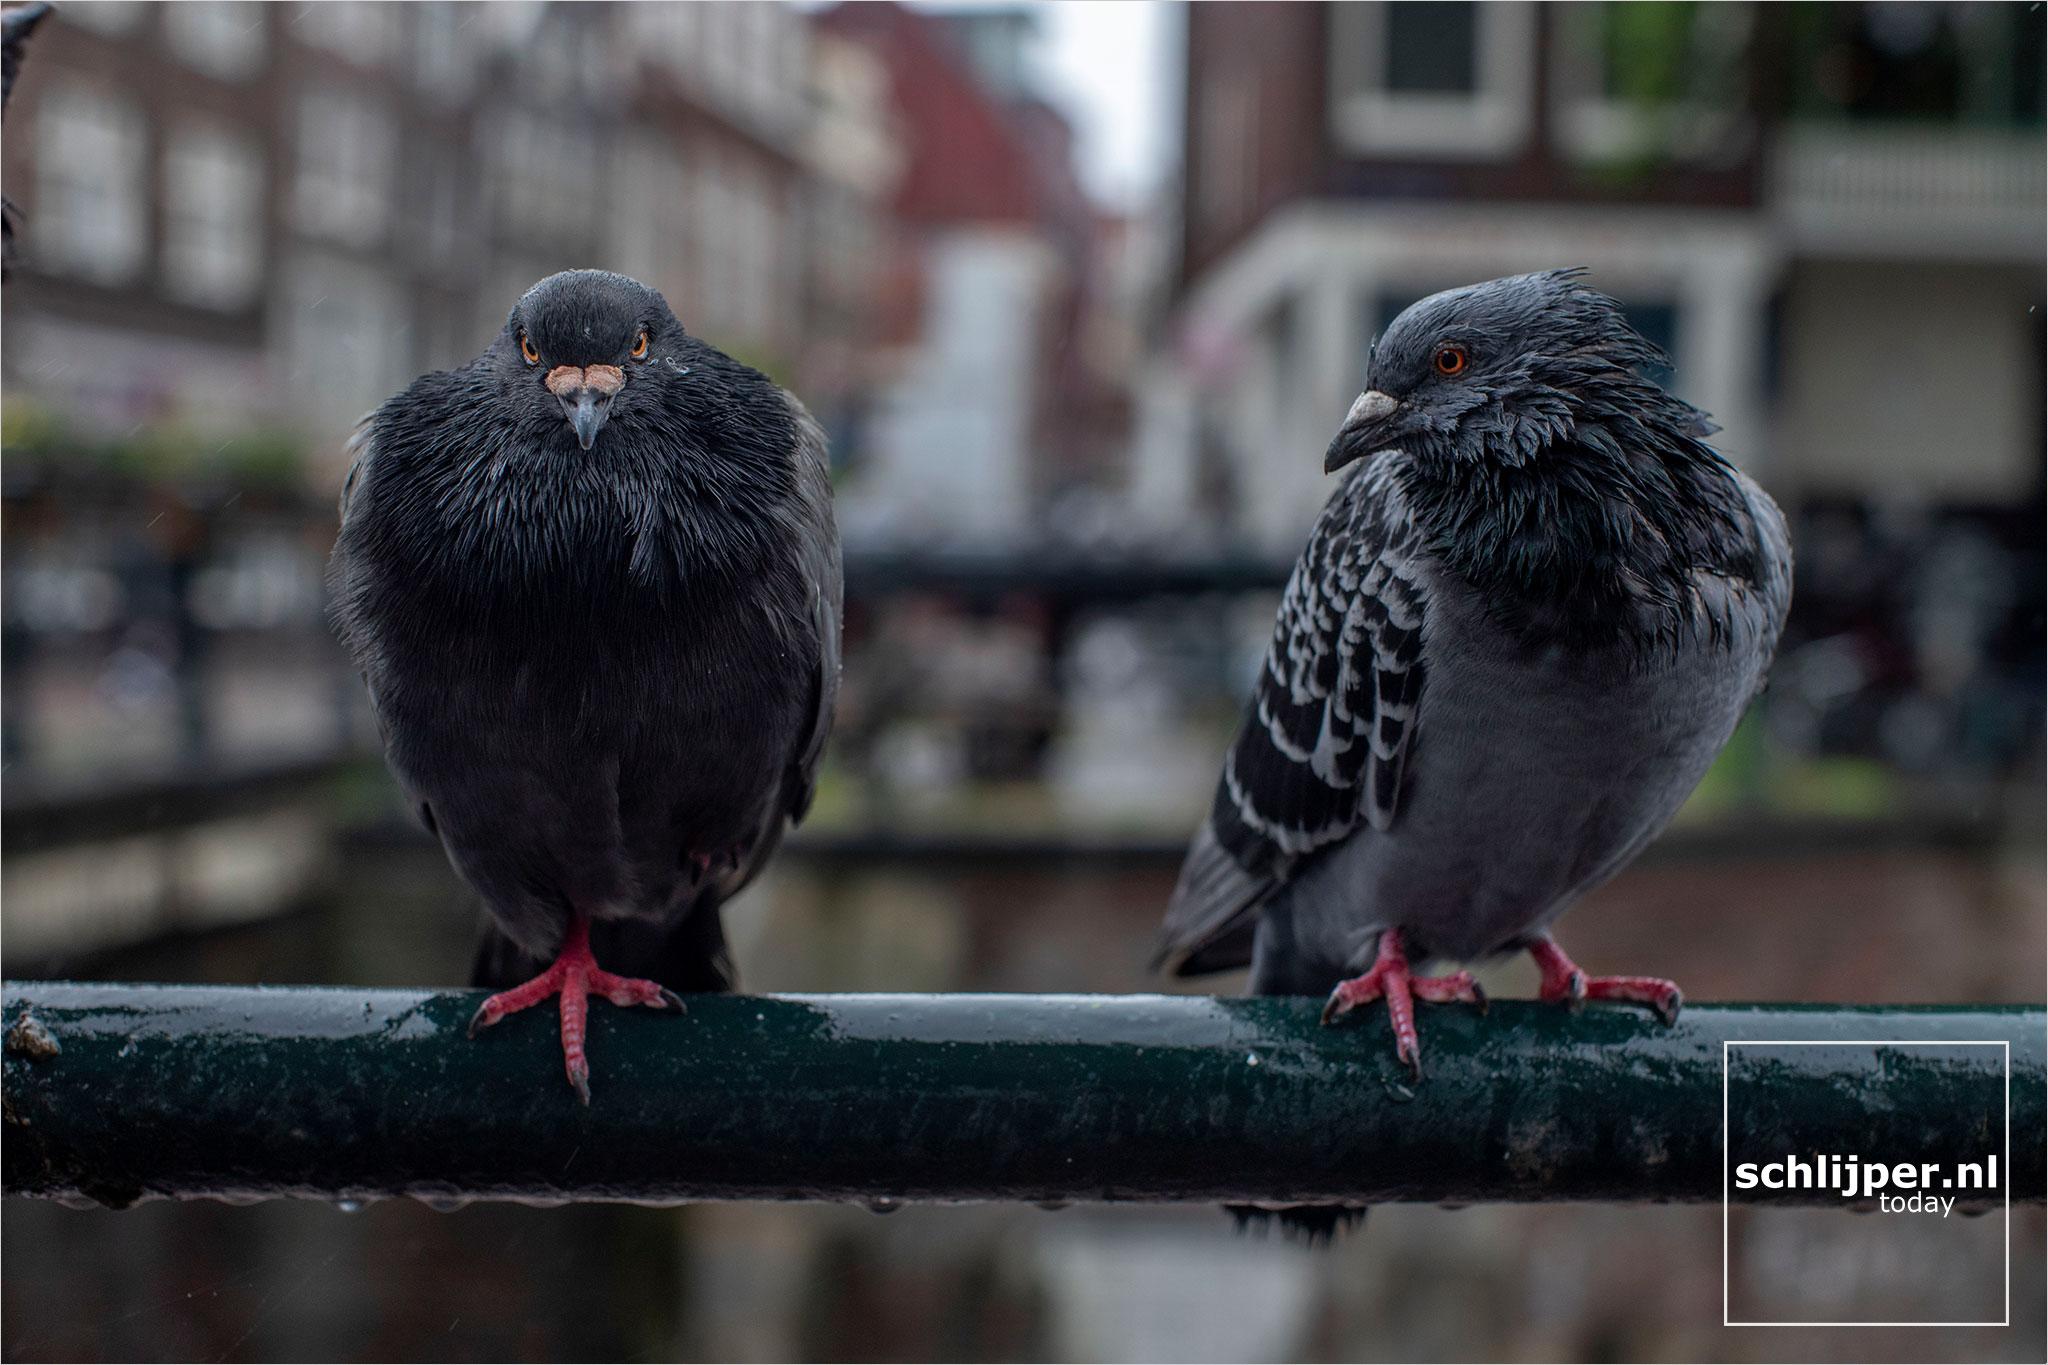 Nederland, Amsterdam, 9 juli 2020